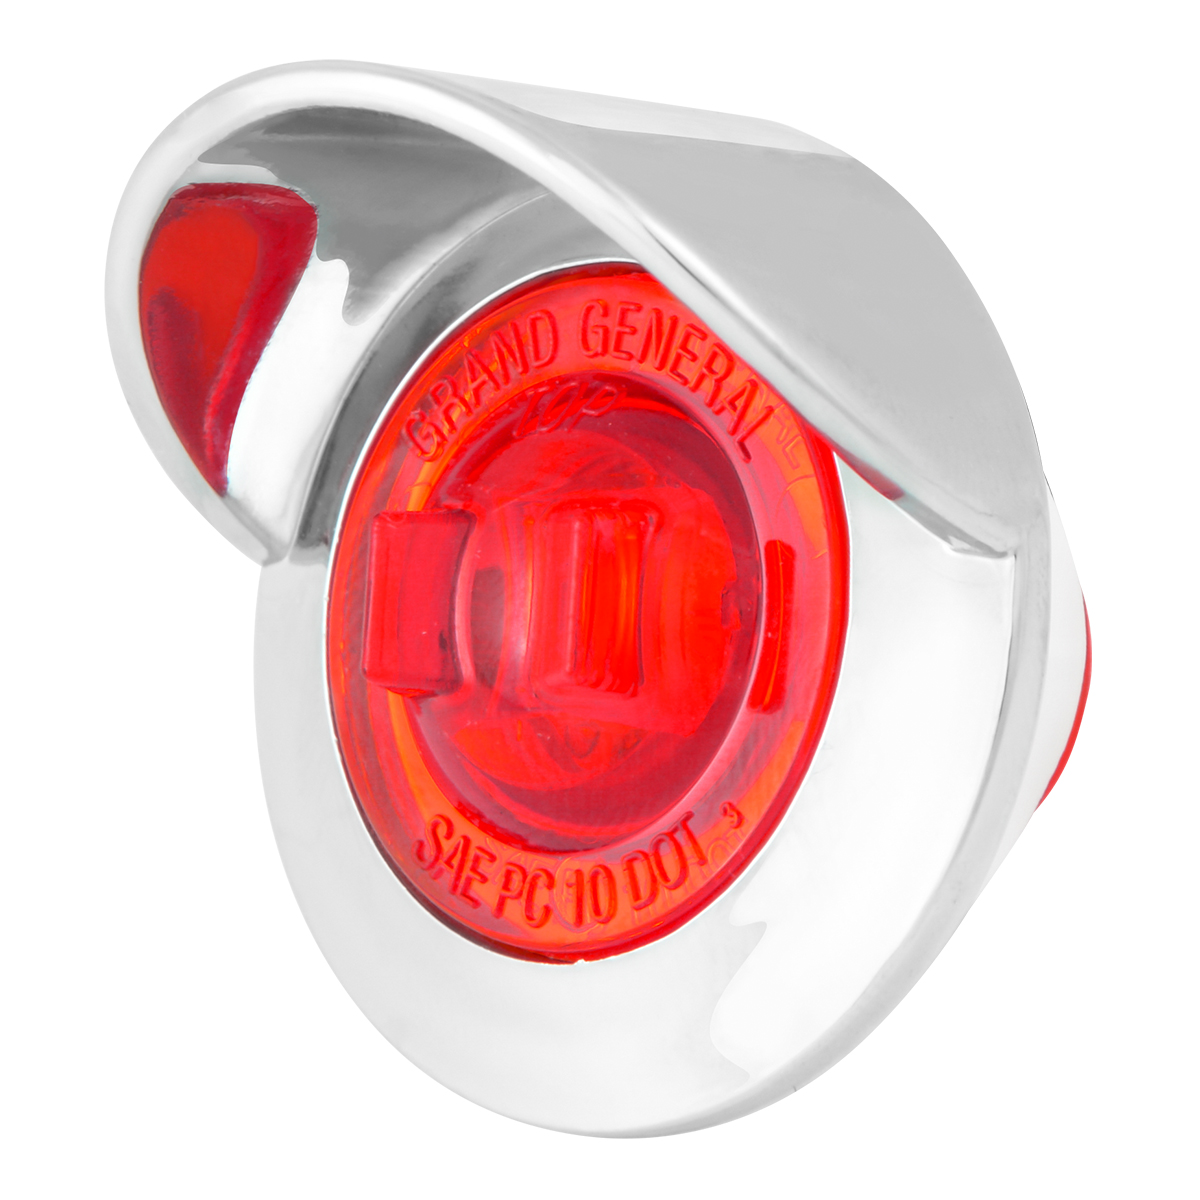 "75232 1-1/4"" Dia. Dual Function LED Light with Chrome Plastic Bezel w/ Visor and Nut"